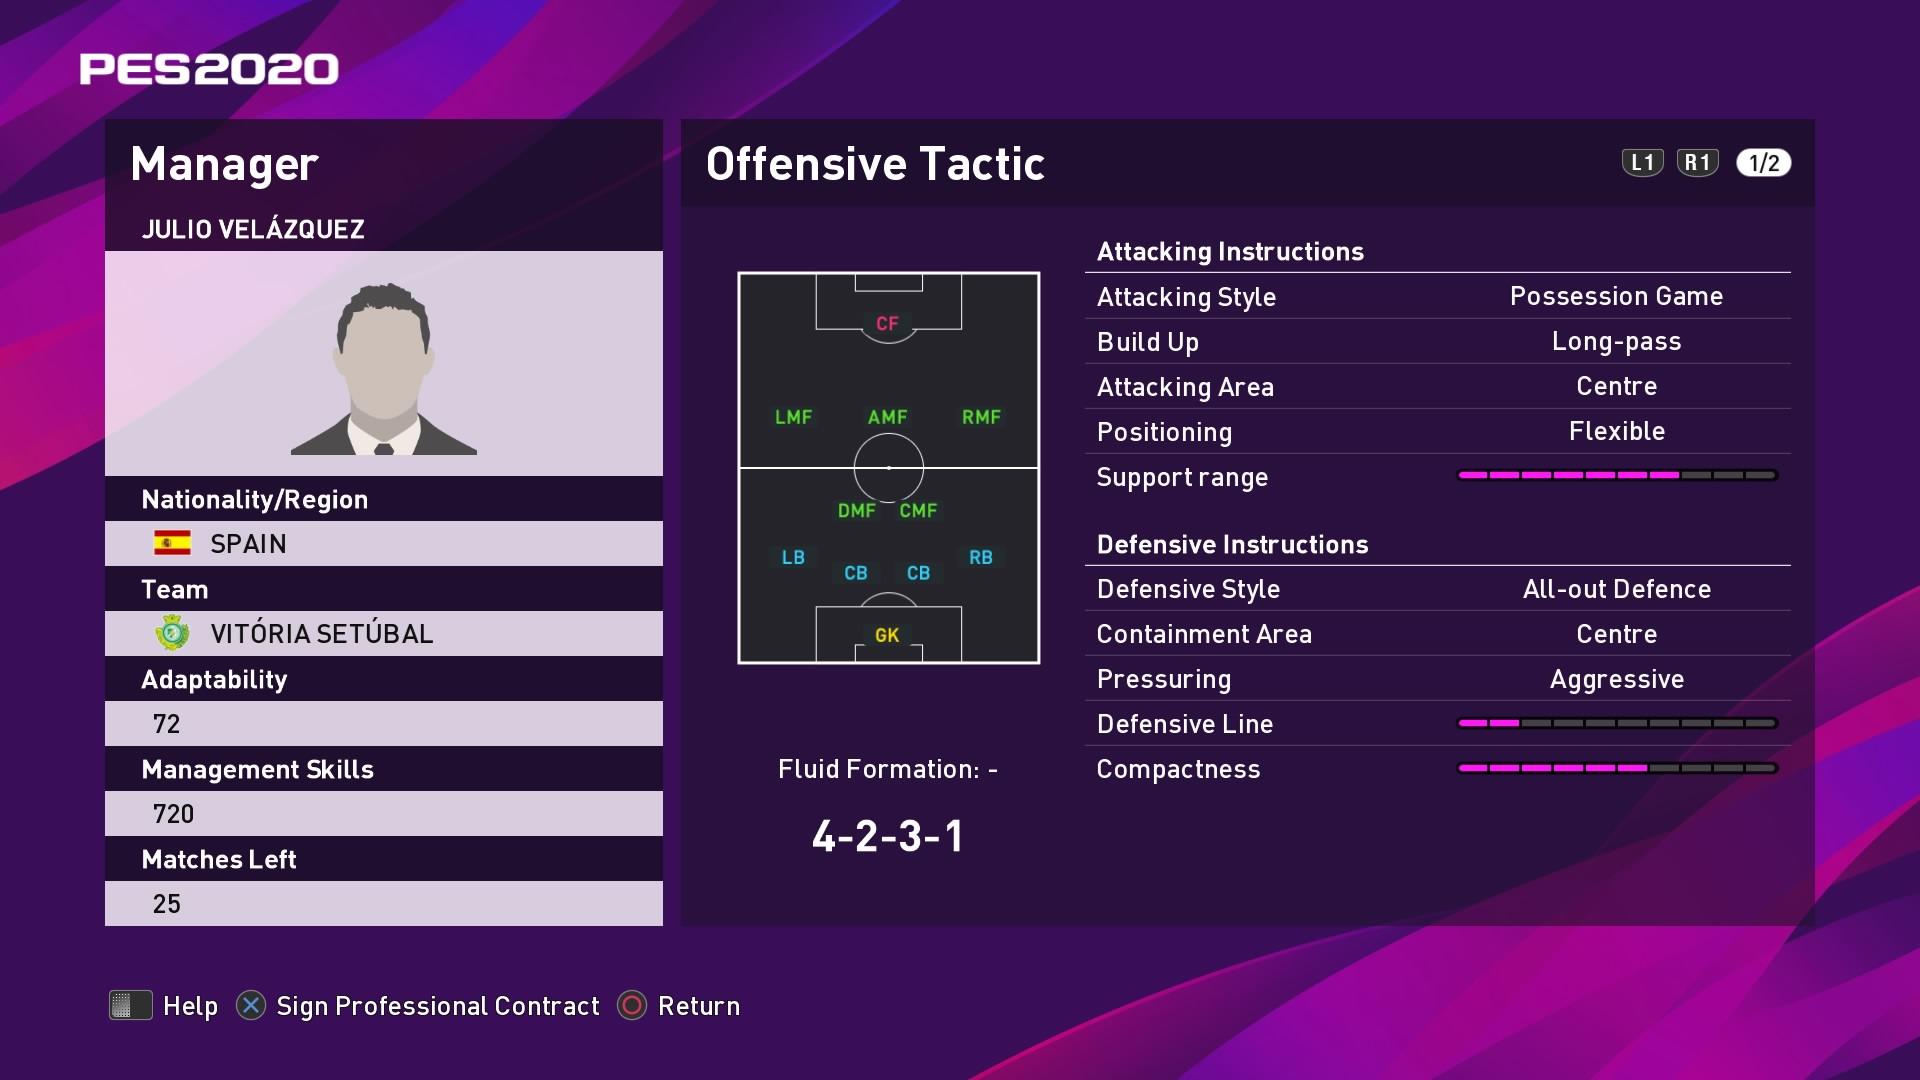 Julio Velázquez Offensive Tactic in PES 2020 myClub